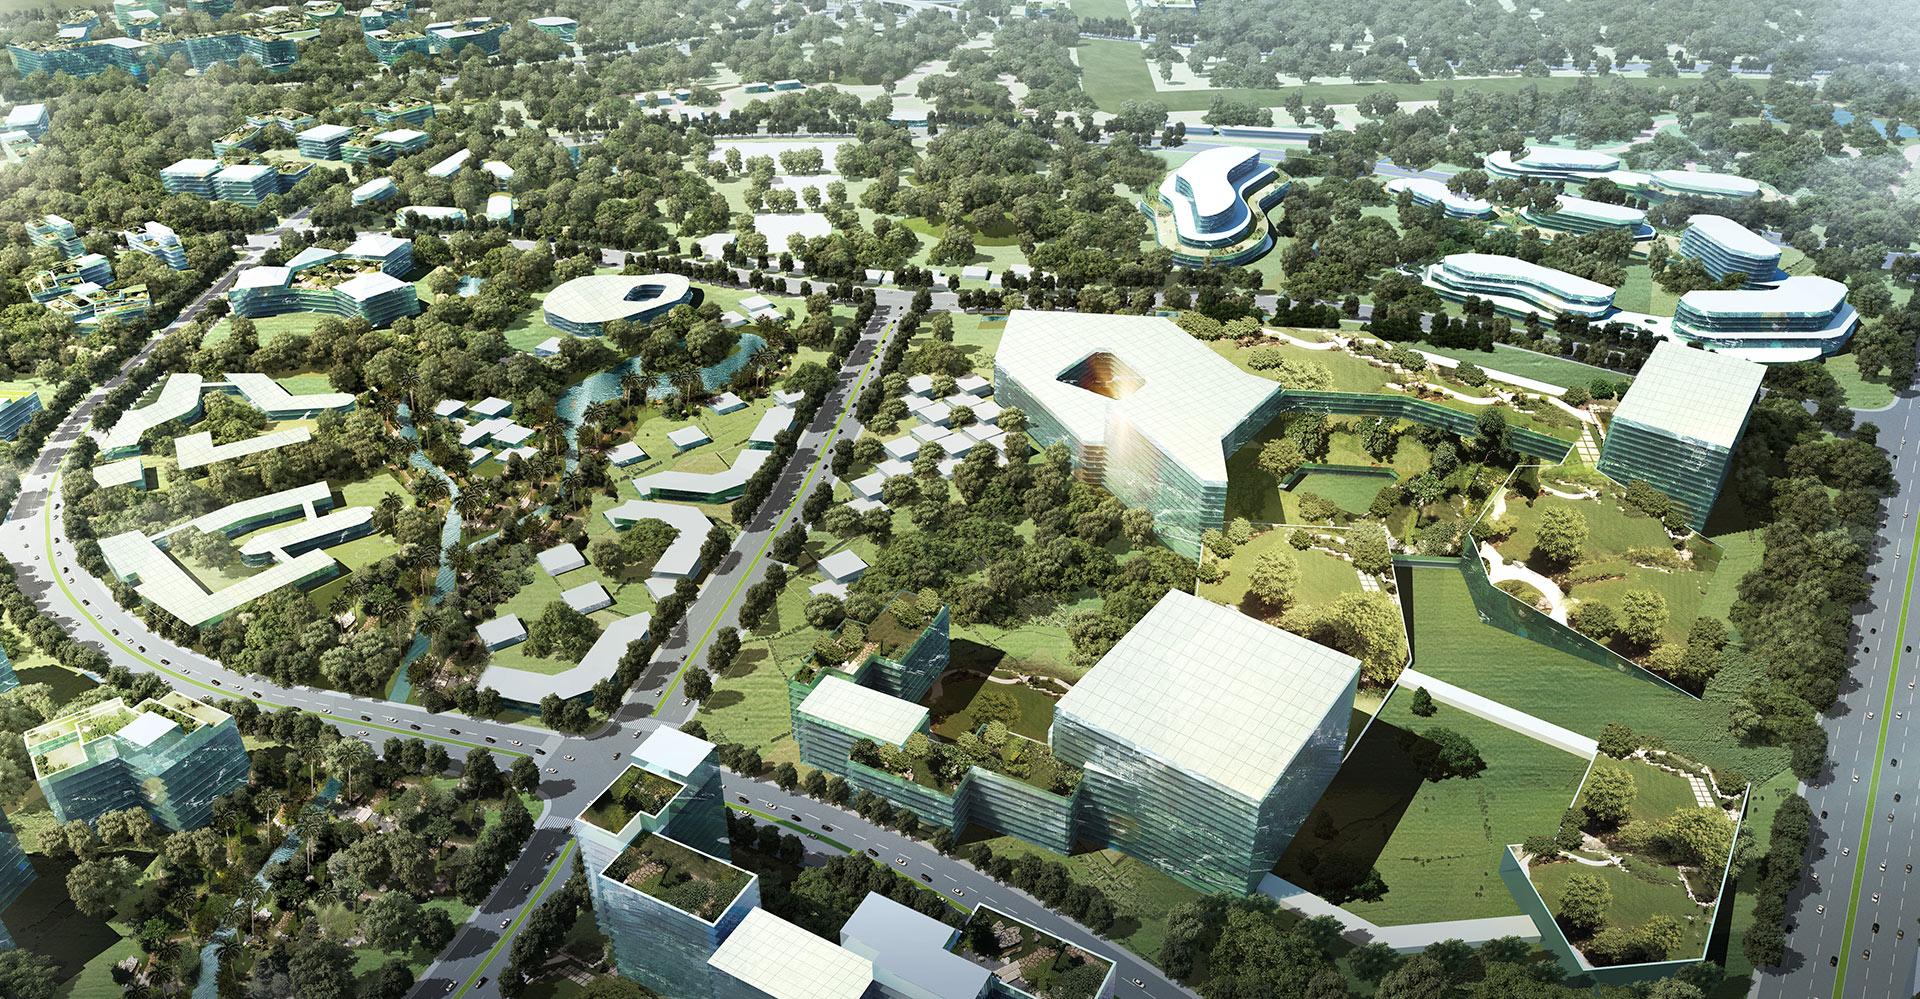 Nusajaya West Master Plan - Malaysia - WATG - Aerial 4